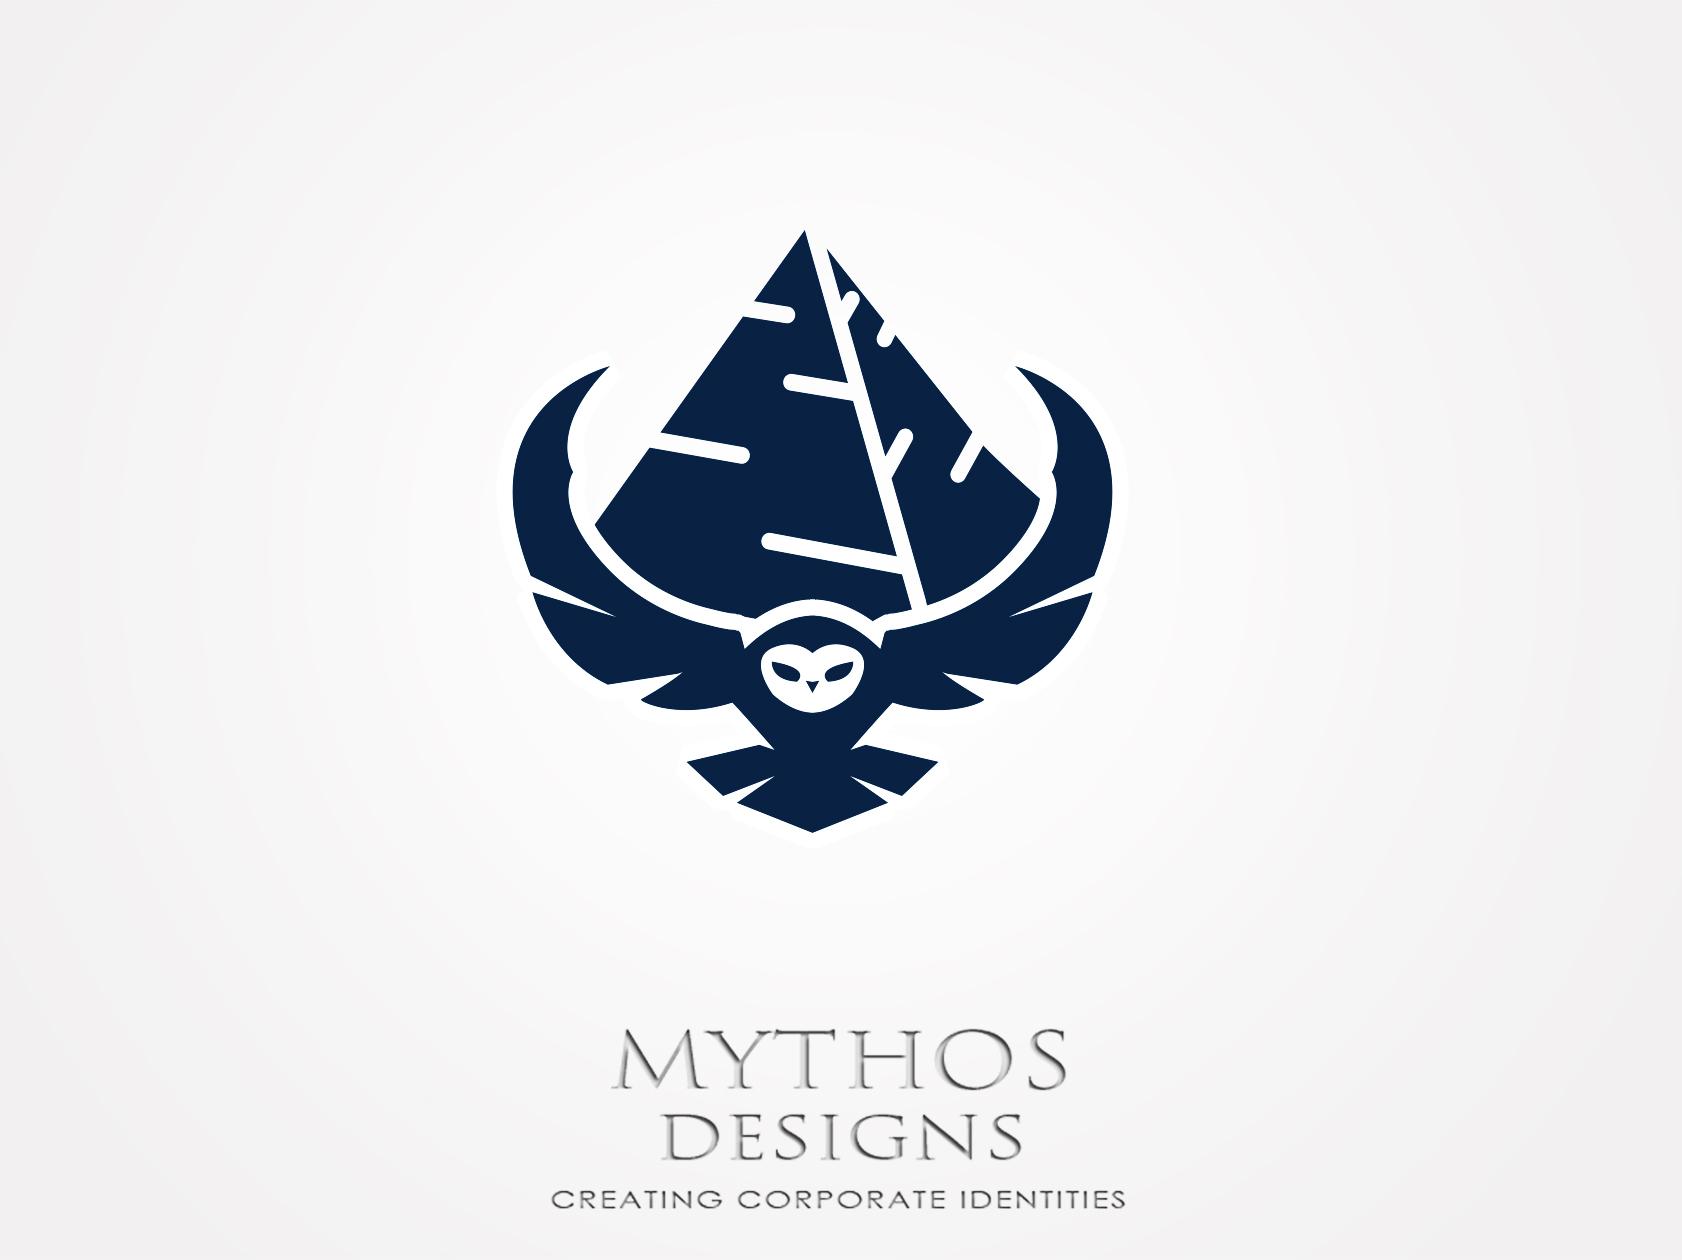 Logo Design by Mythos Designs - Entry No. 16 in the Logo Design Contest Unique Logo Design Wanted for Master Paste Original™.